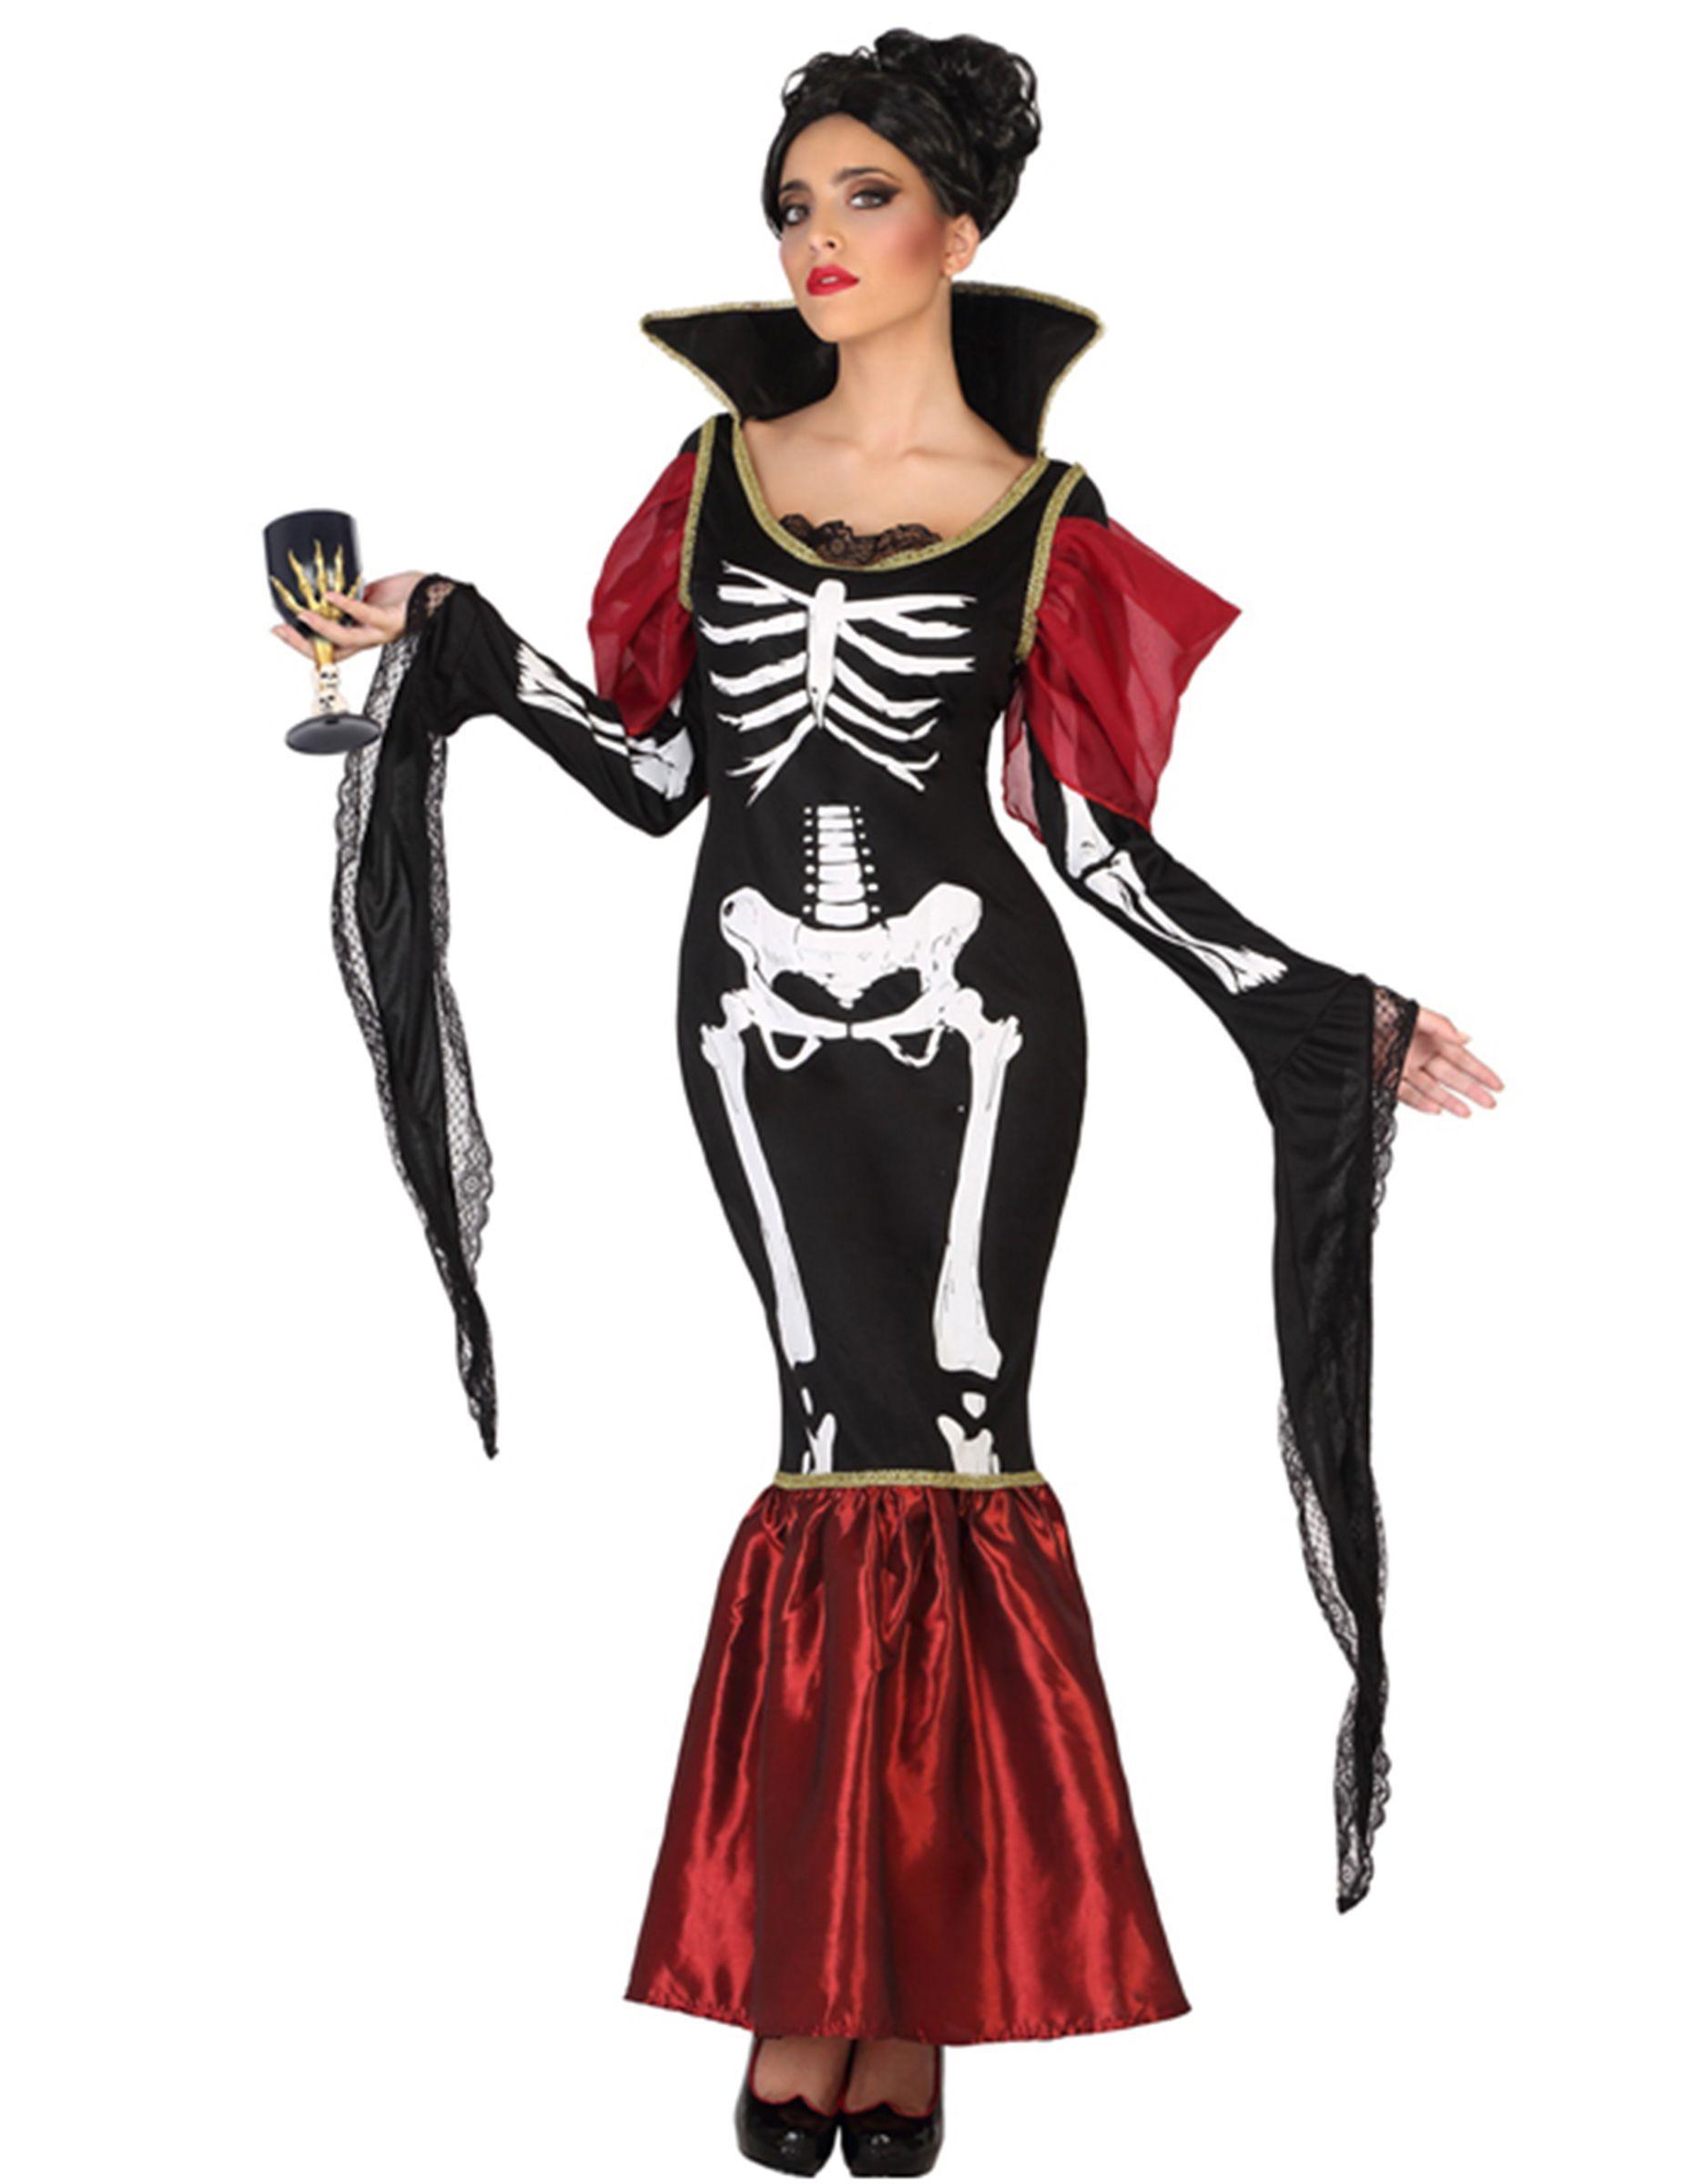 Costume vampiro scheletro donna halloween  Un travestimento da scheletro  vampiro per donna composto da un 8d599a1d74df